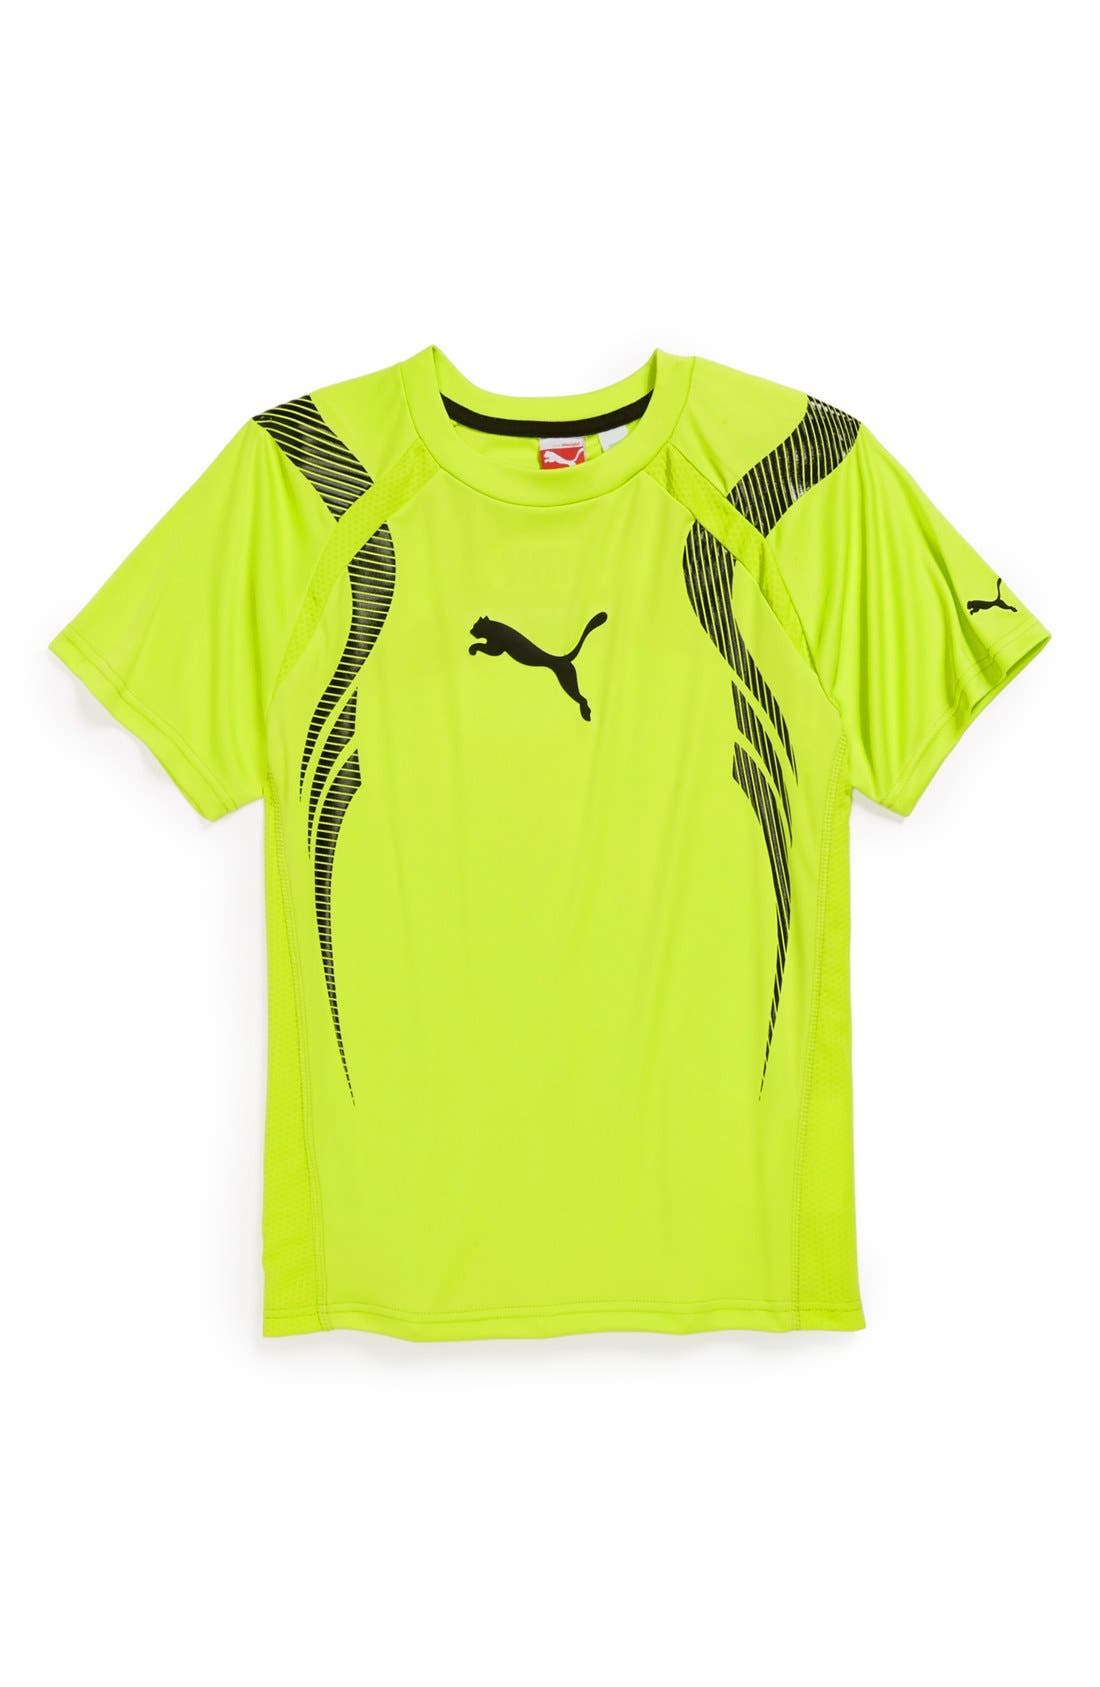 Main Image - PUMA 'Acceleration' Short Sleeve T-Shirt (Little Boys)